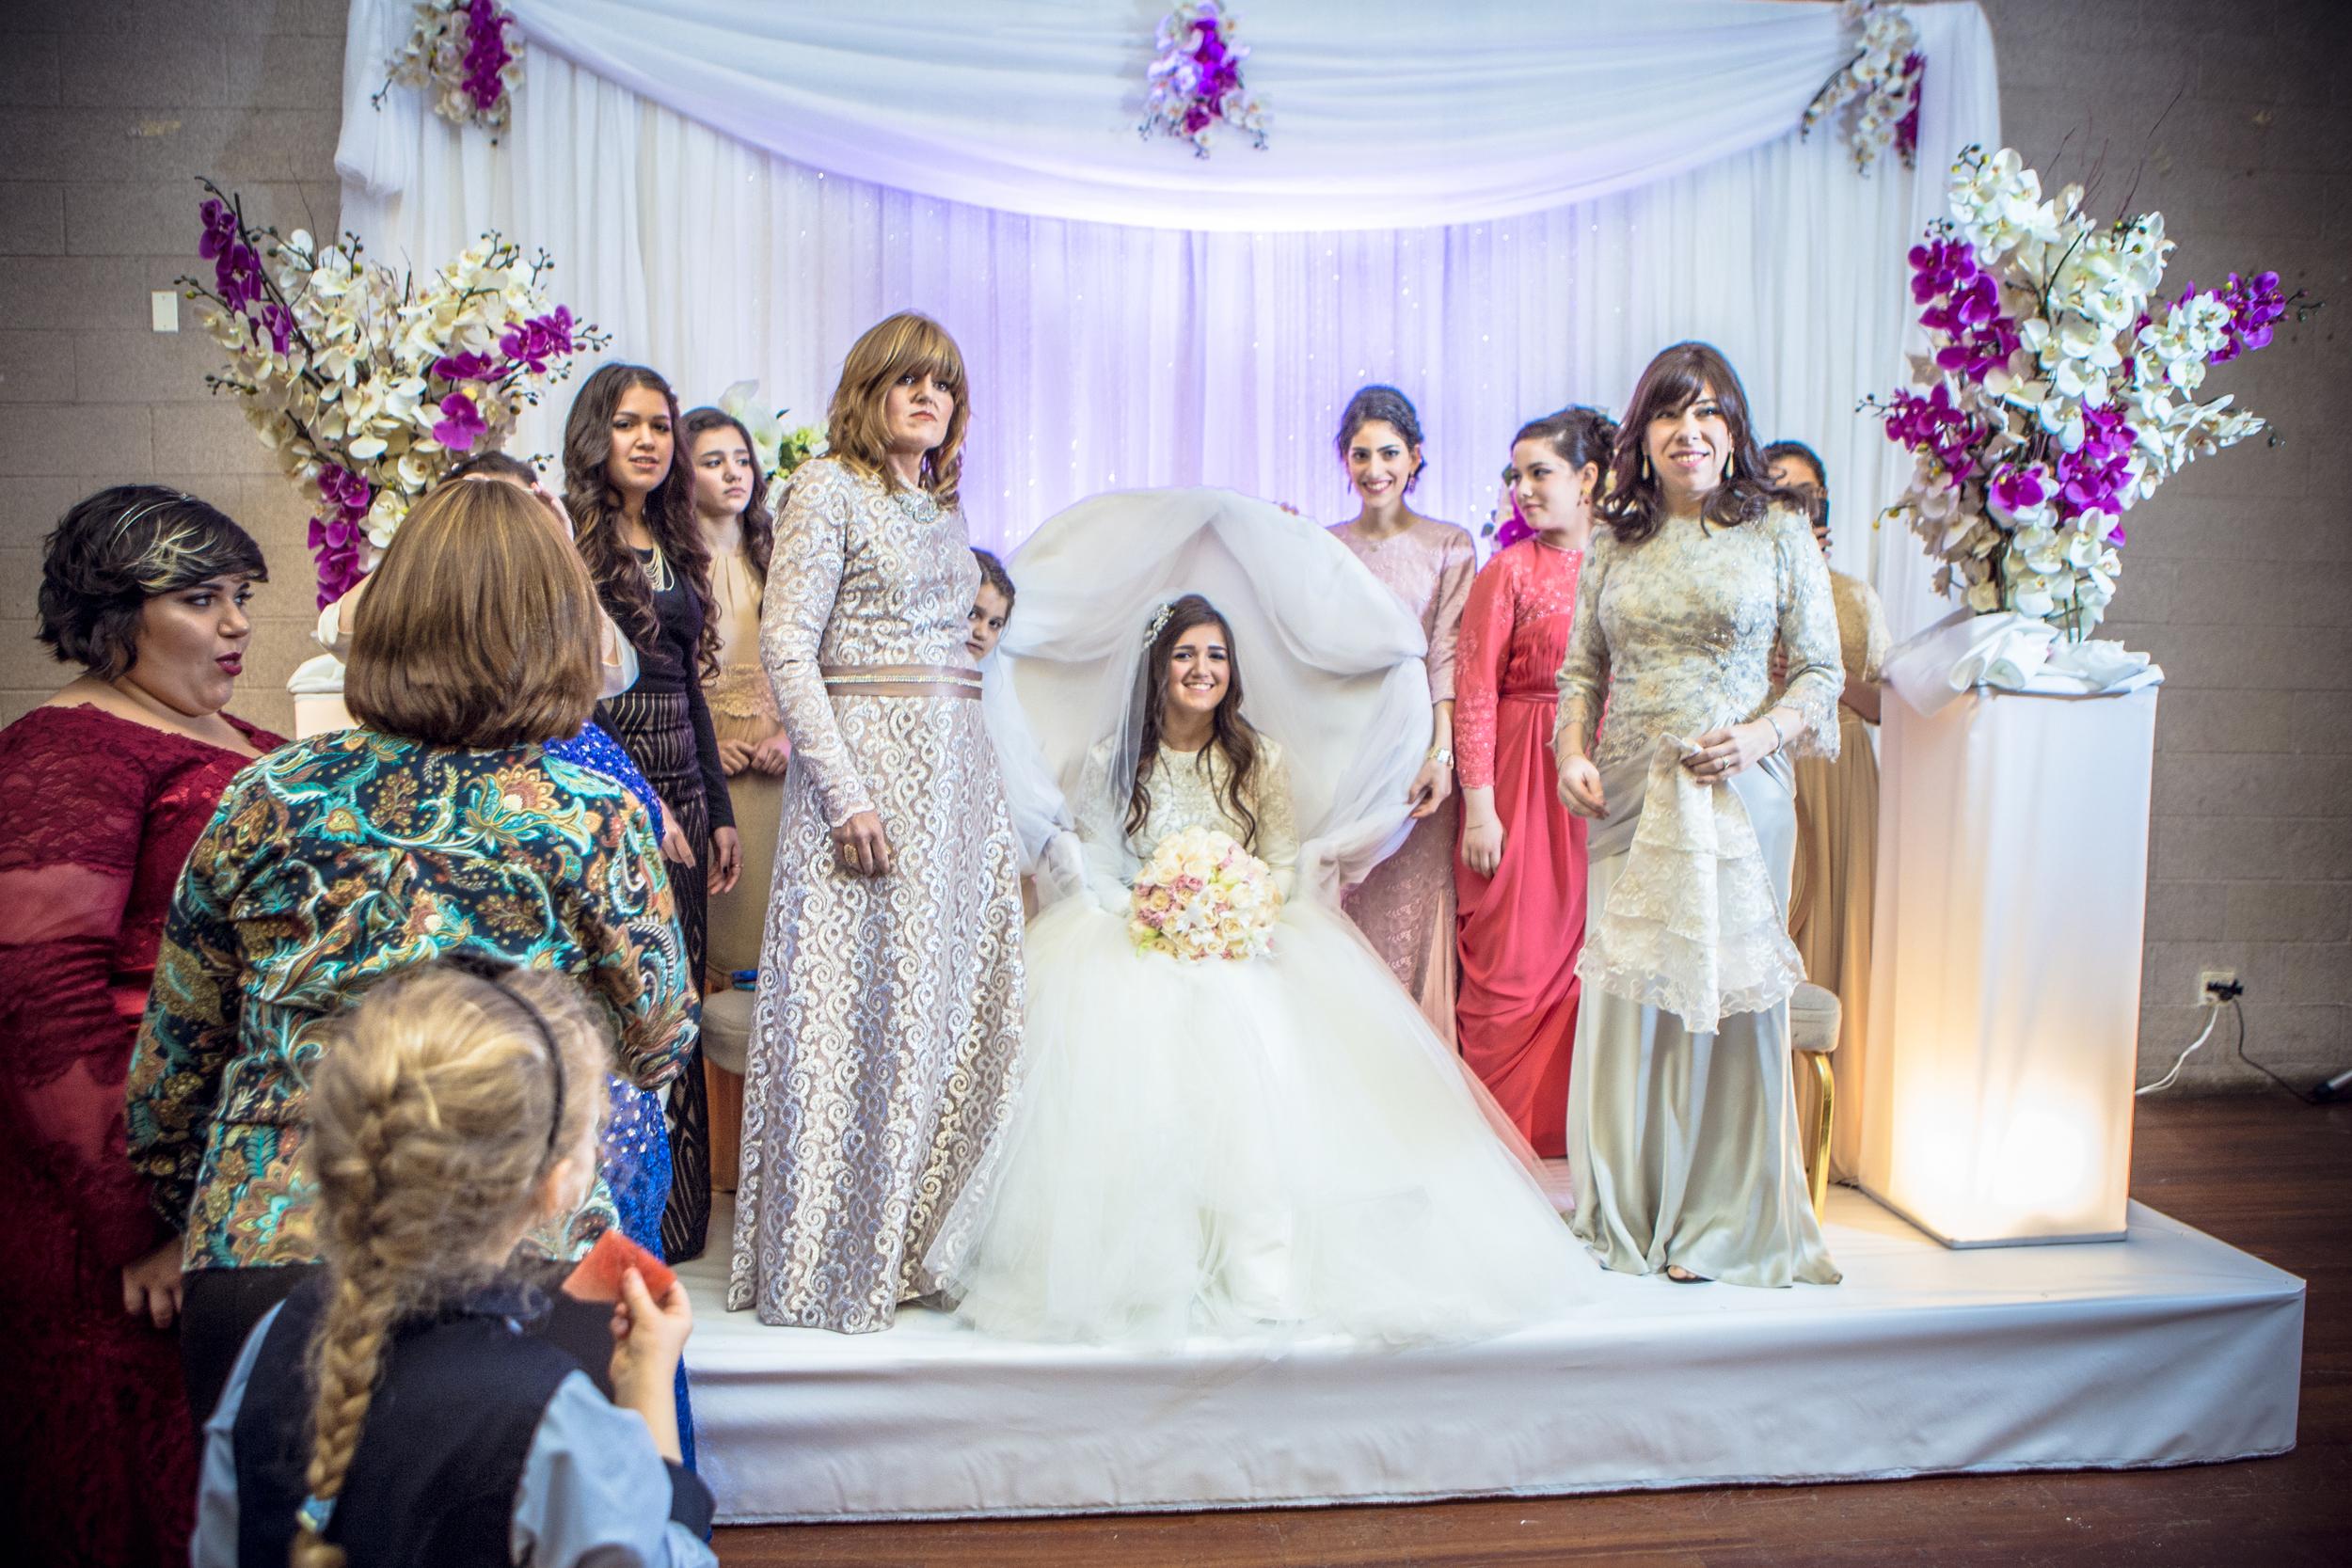 Wedding Iossi and Gitty Khafif  - Eliau Piha studio photography, new york, events, people 770 brooklyn -0311.jpg